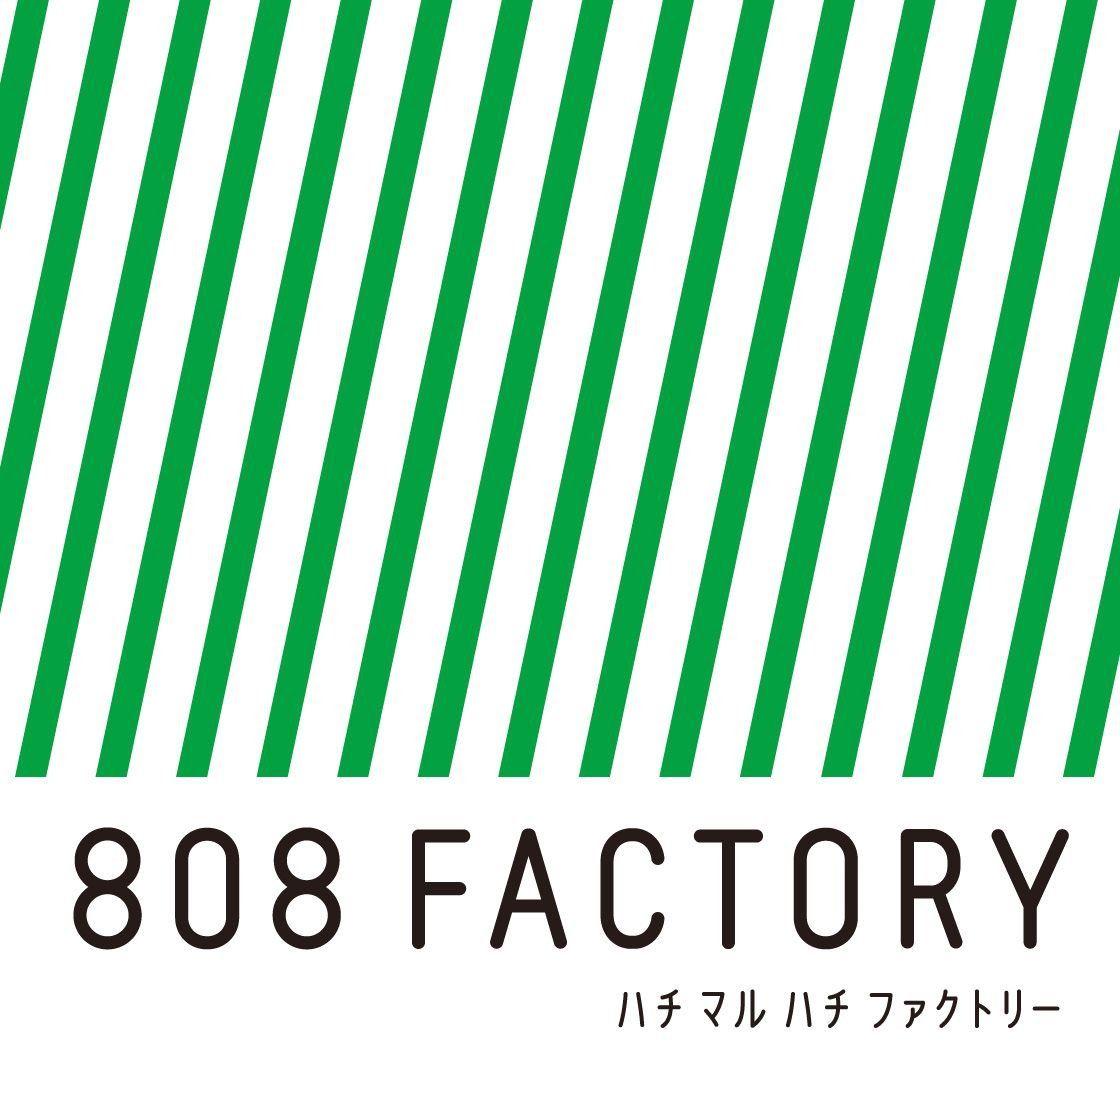 808 factory 新日邦 hotchkiss 1000 in 2020 typography logo logo design design elements